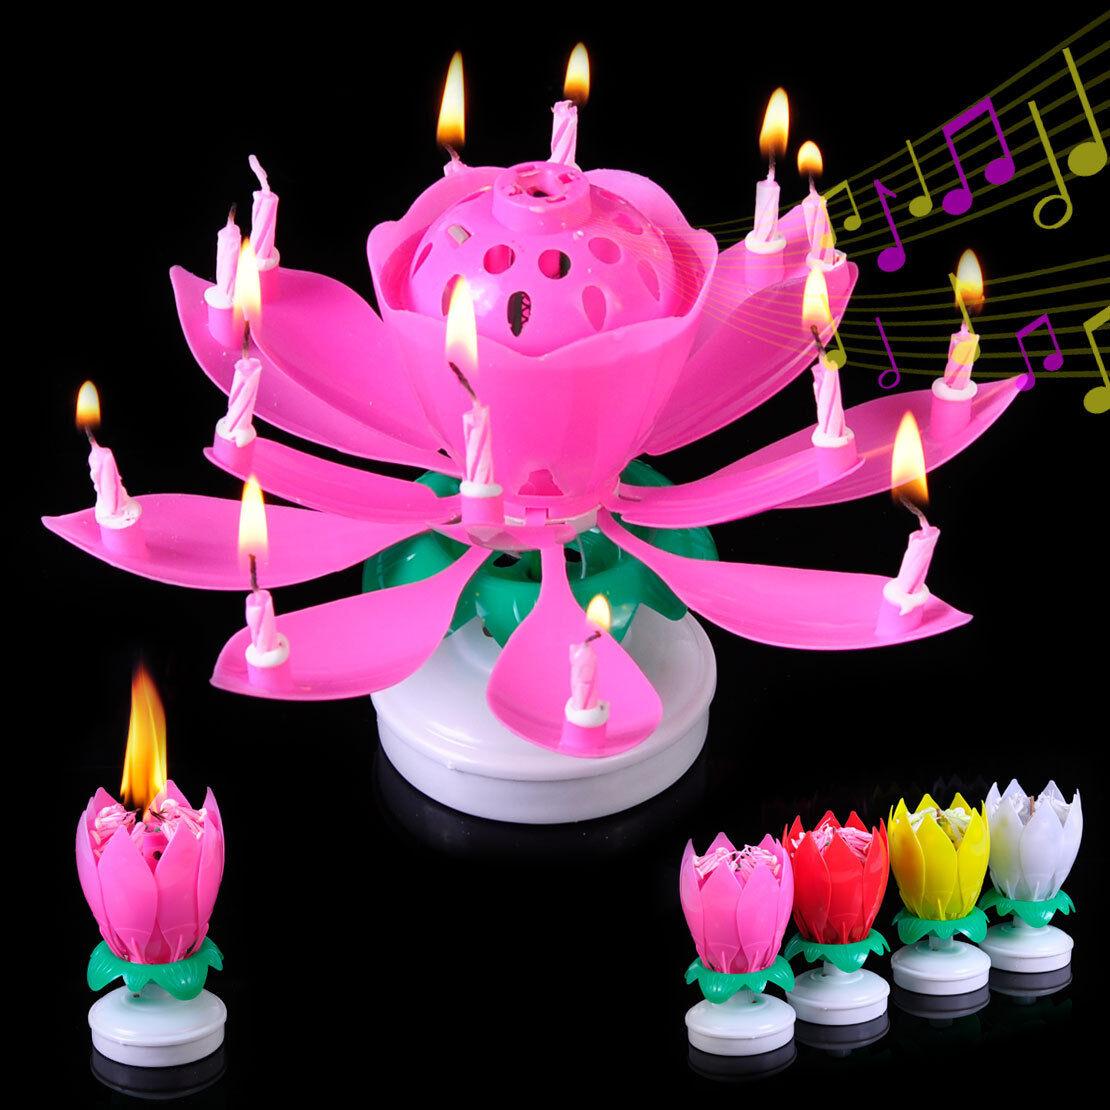 Geburtstagskerze Happy Birthday Musik Feuerwerk Torte